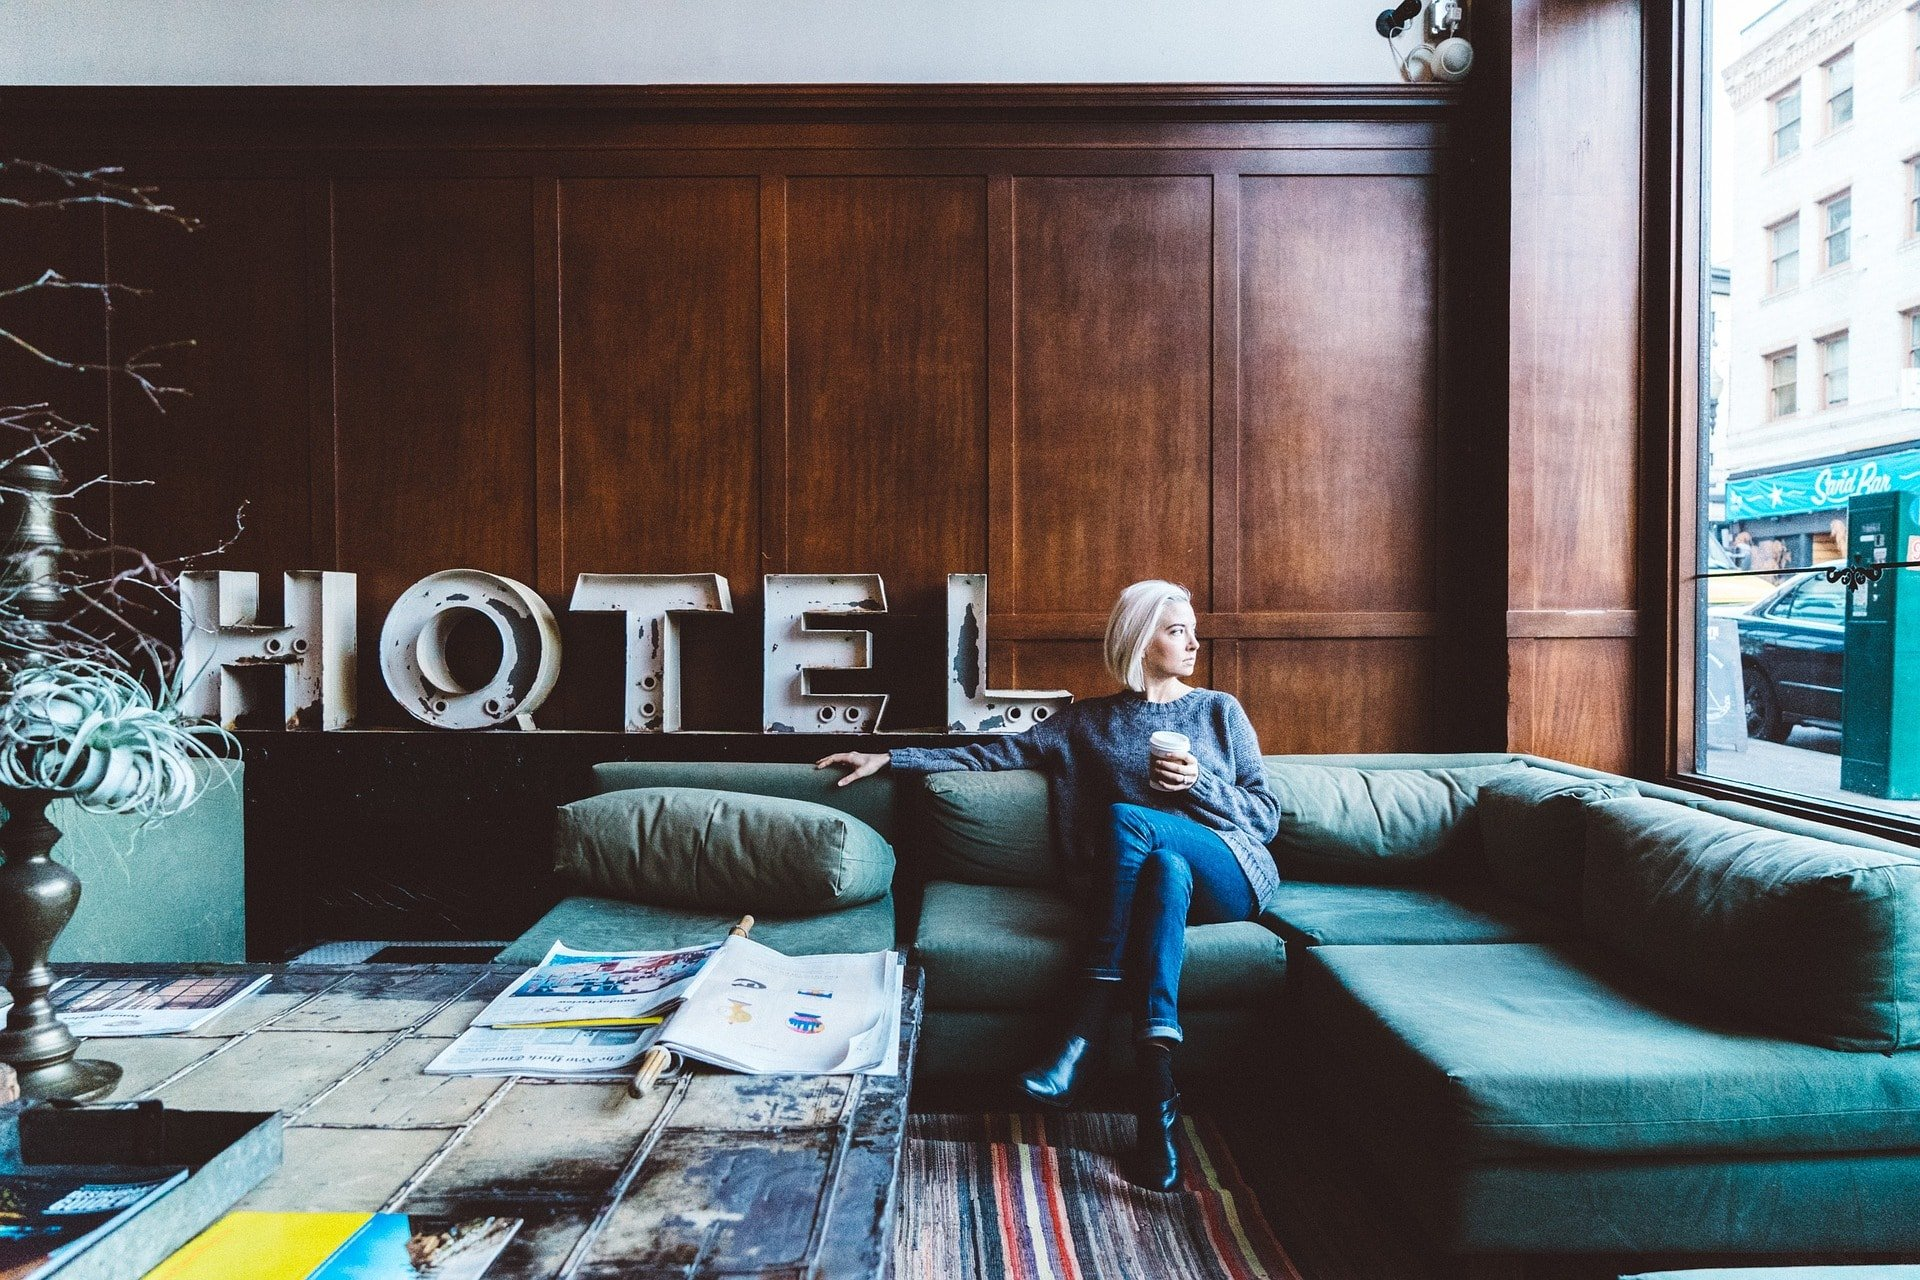 Chaise longue moderno y elegante hotel - MakroMueble